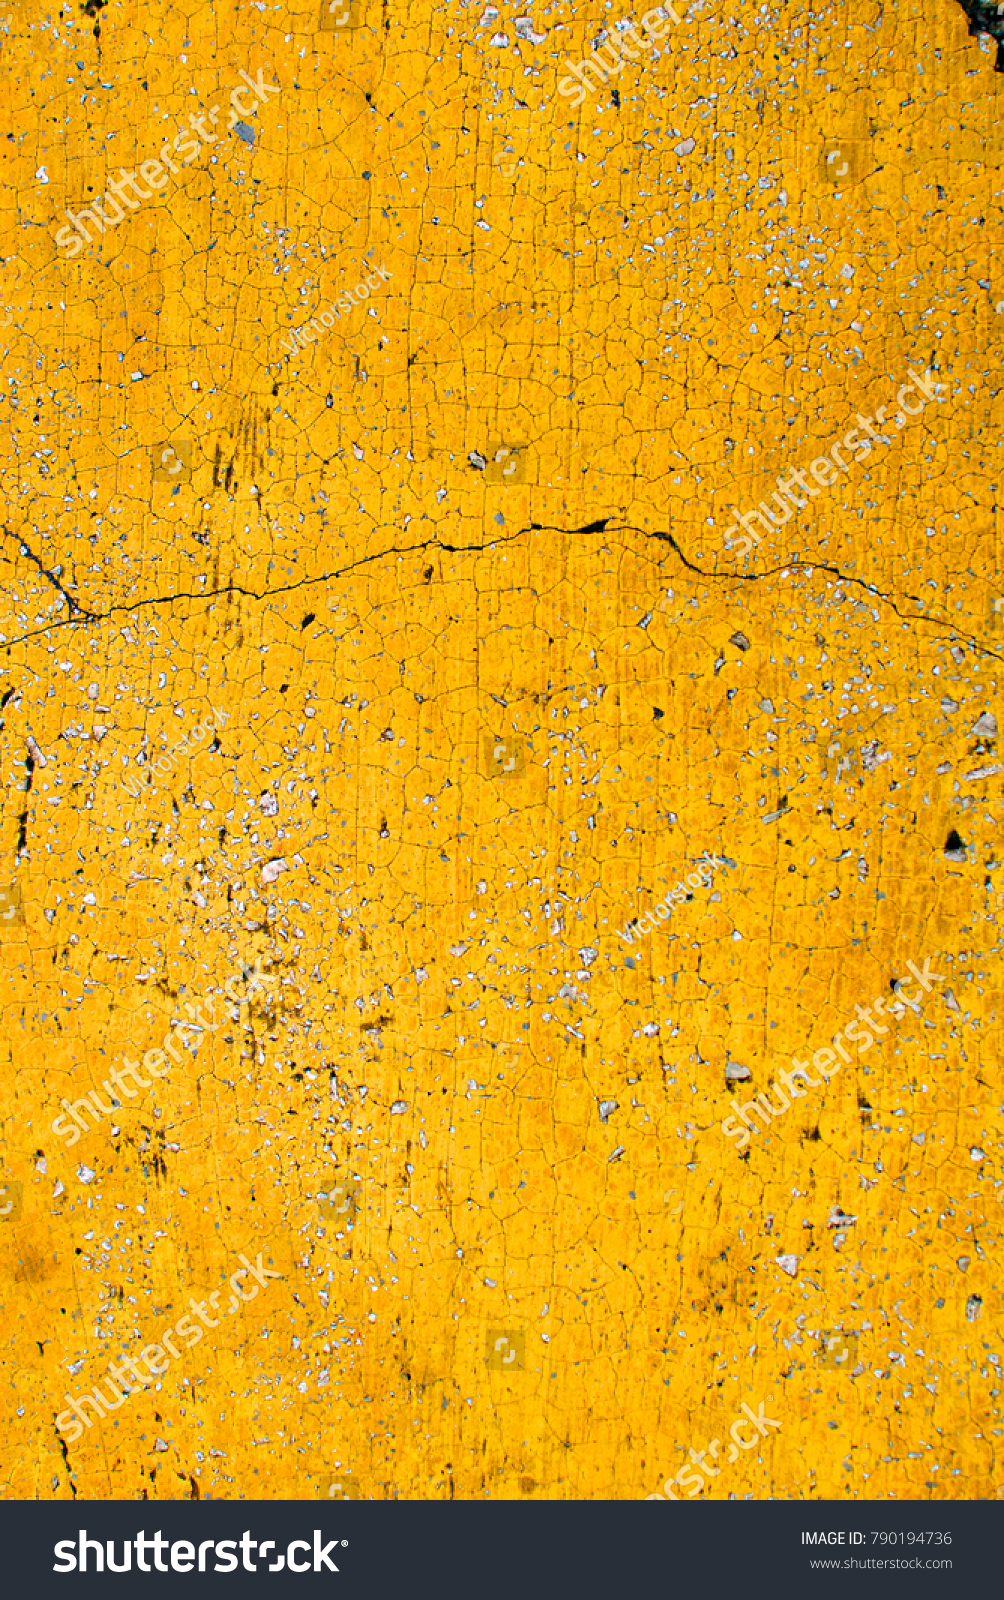 Close Yellow Wall Texture Cracks Vibrant Stock Photo (Royalty Free ...